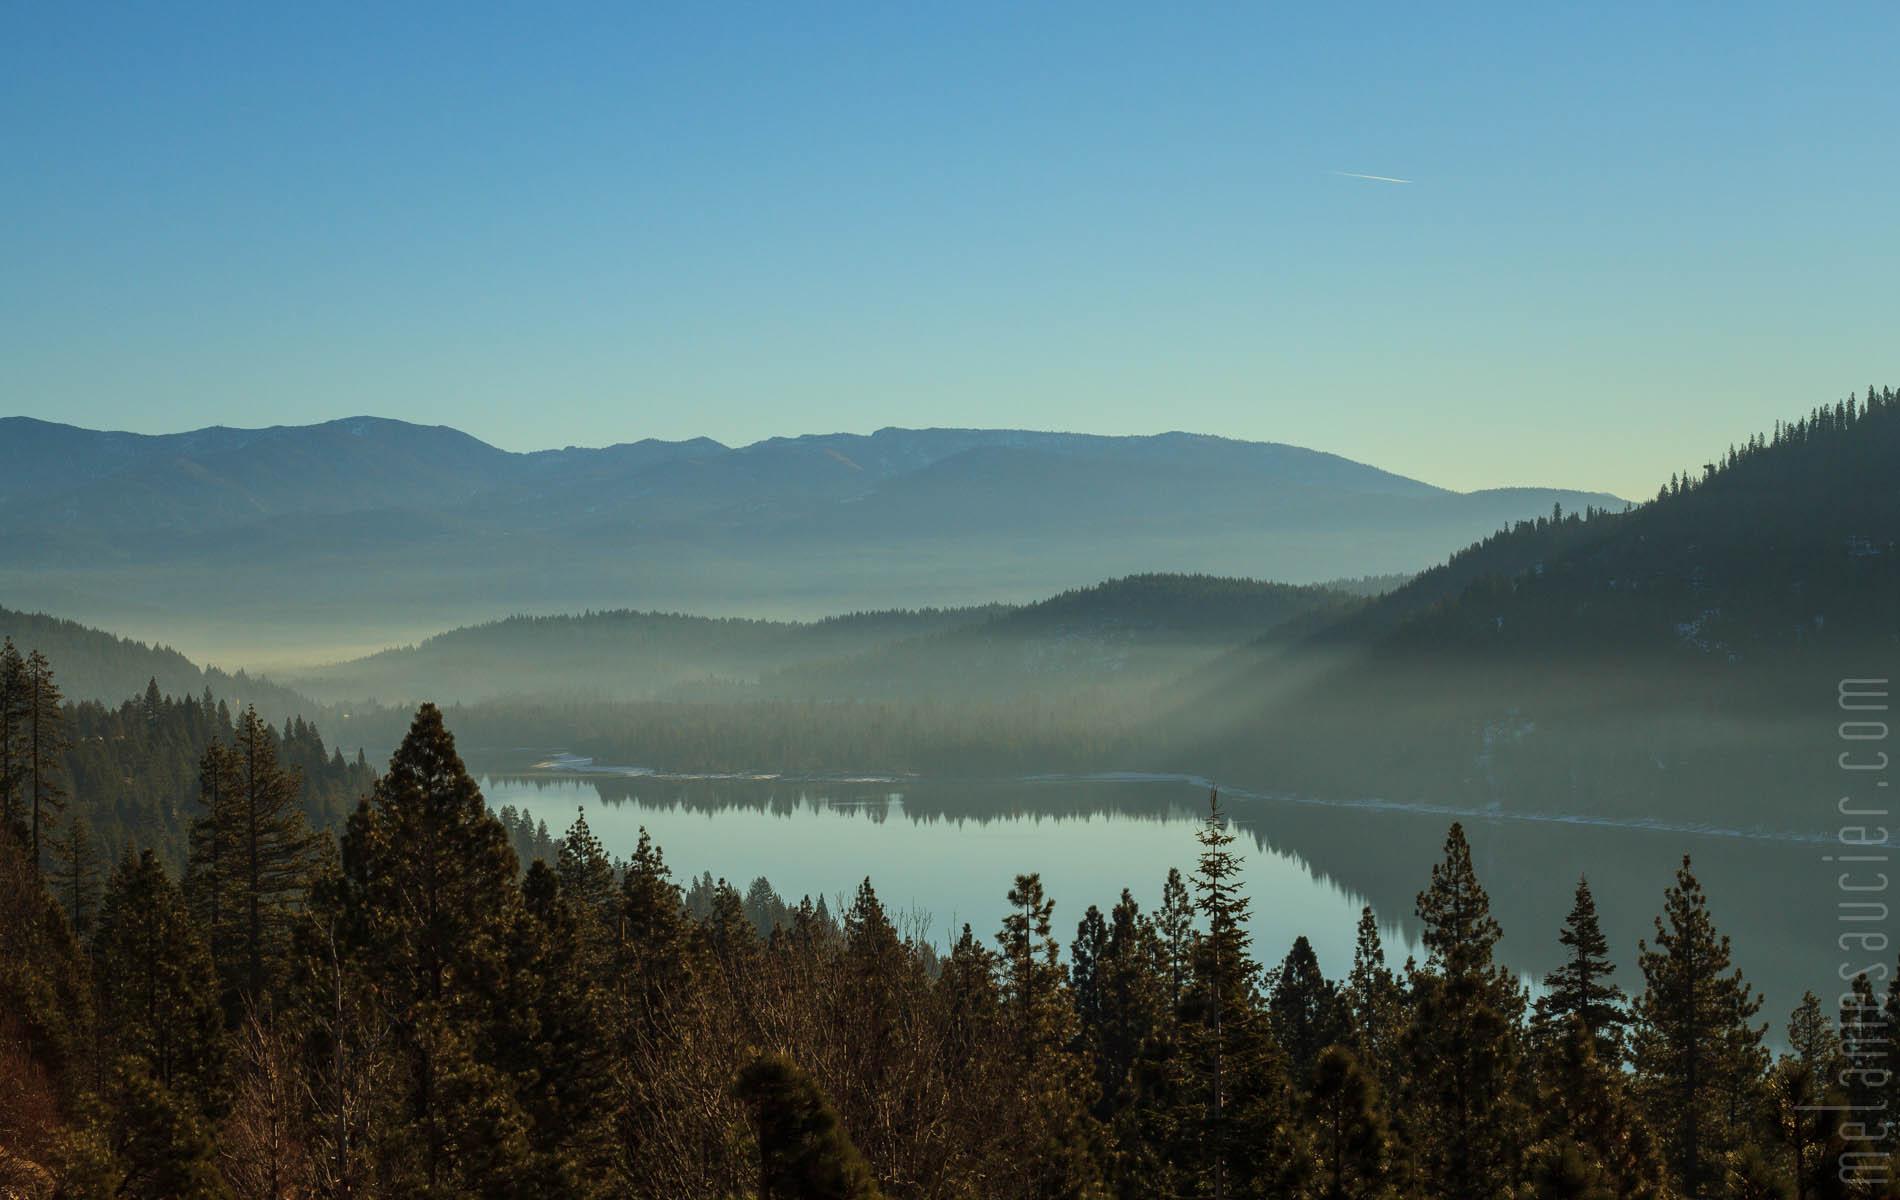 Donner_Lake-1900x1200.jpg